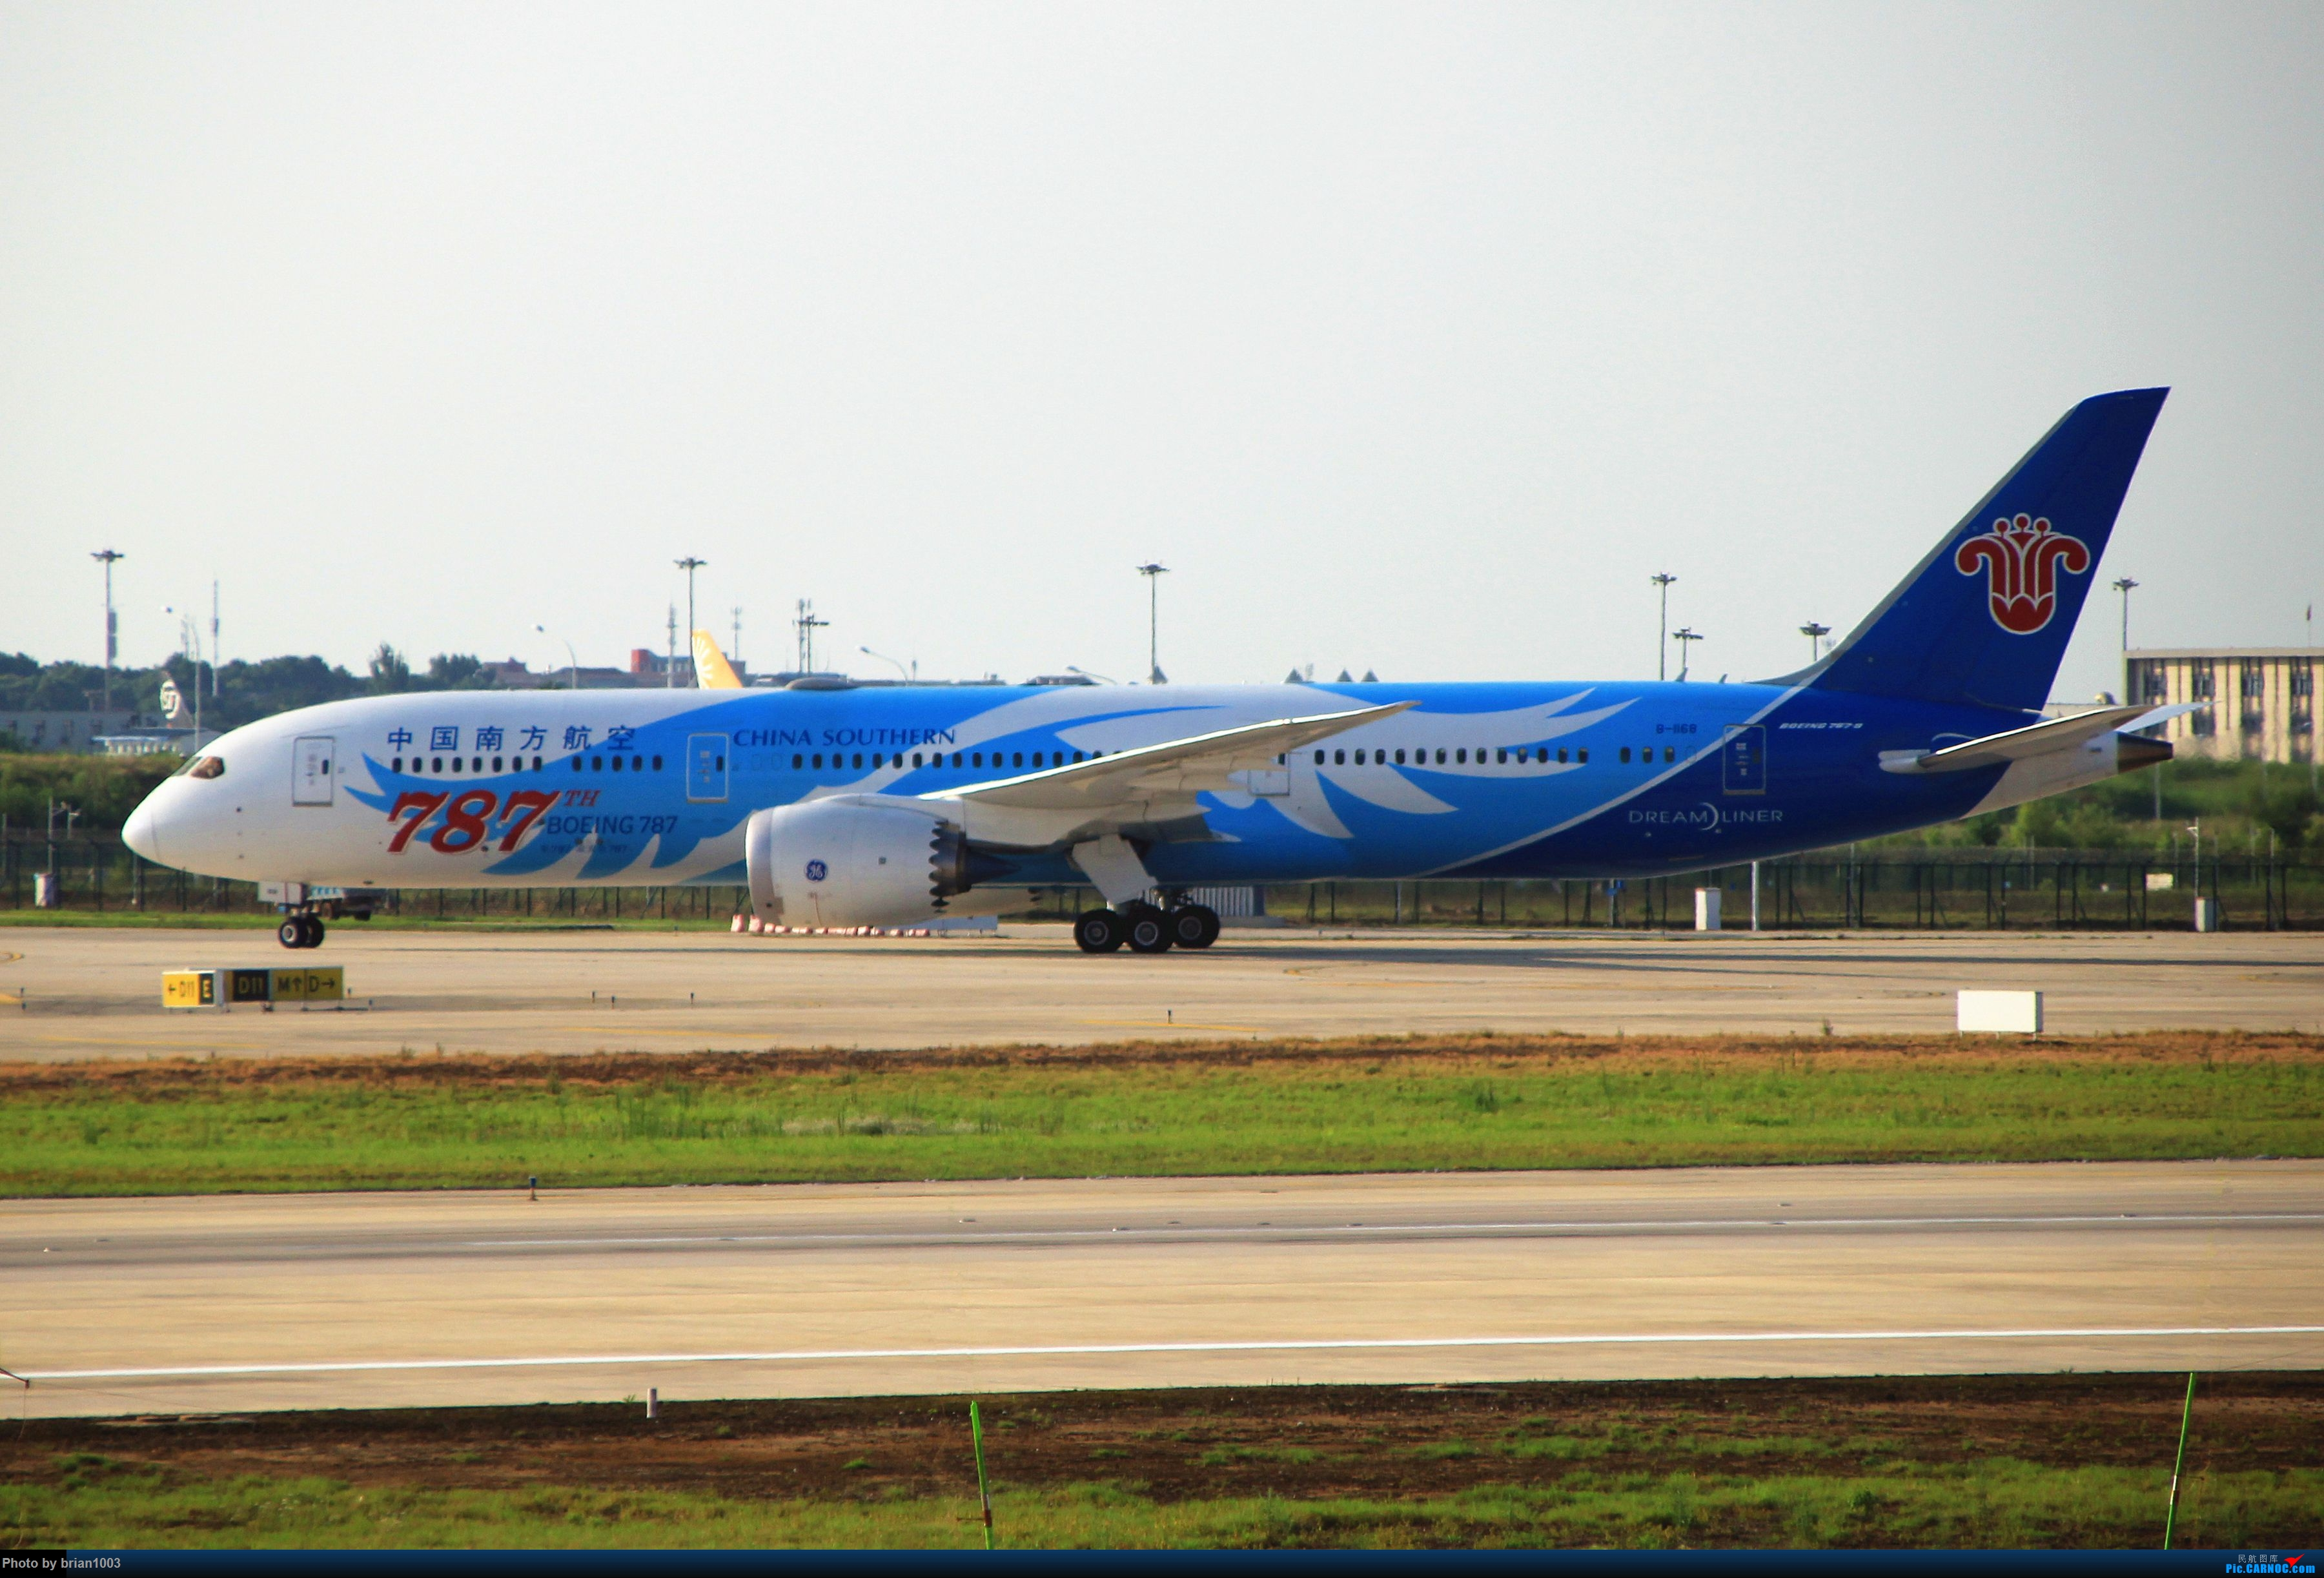 Re:[原创]WUH武汉天河机场拍机之喜迎纽约直飞 BOEING 787-9 B-1168 中国武汉天河国际机场